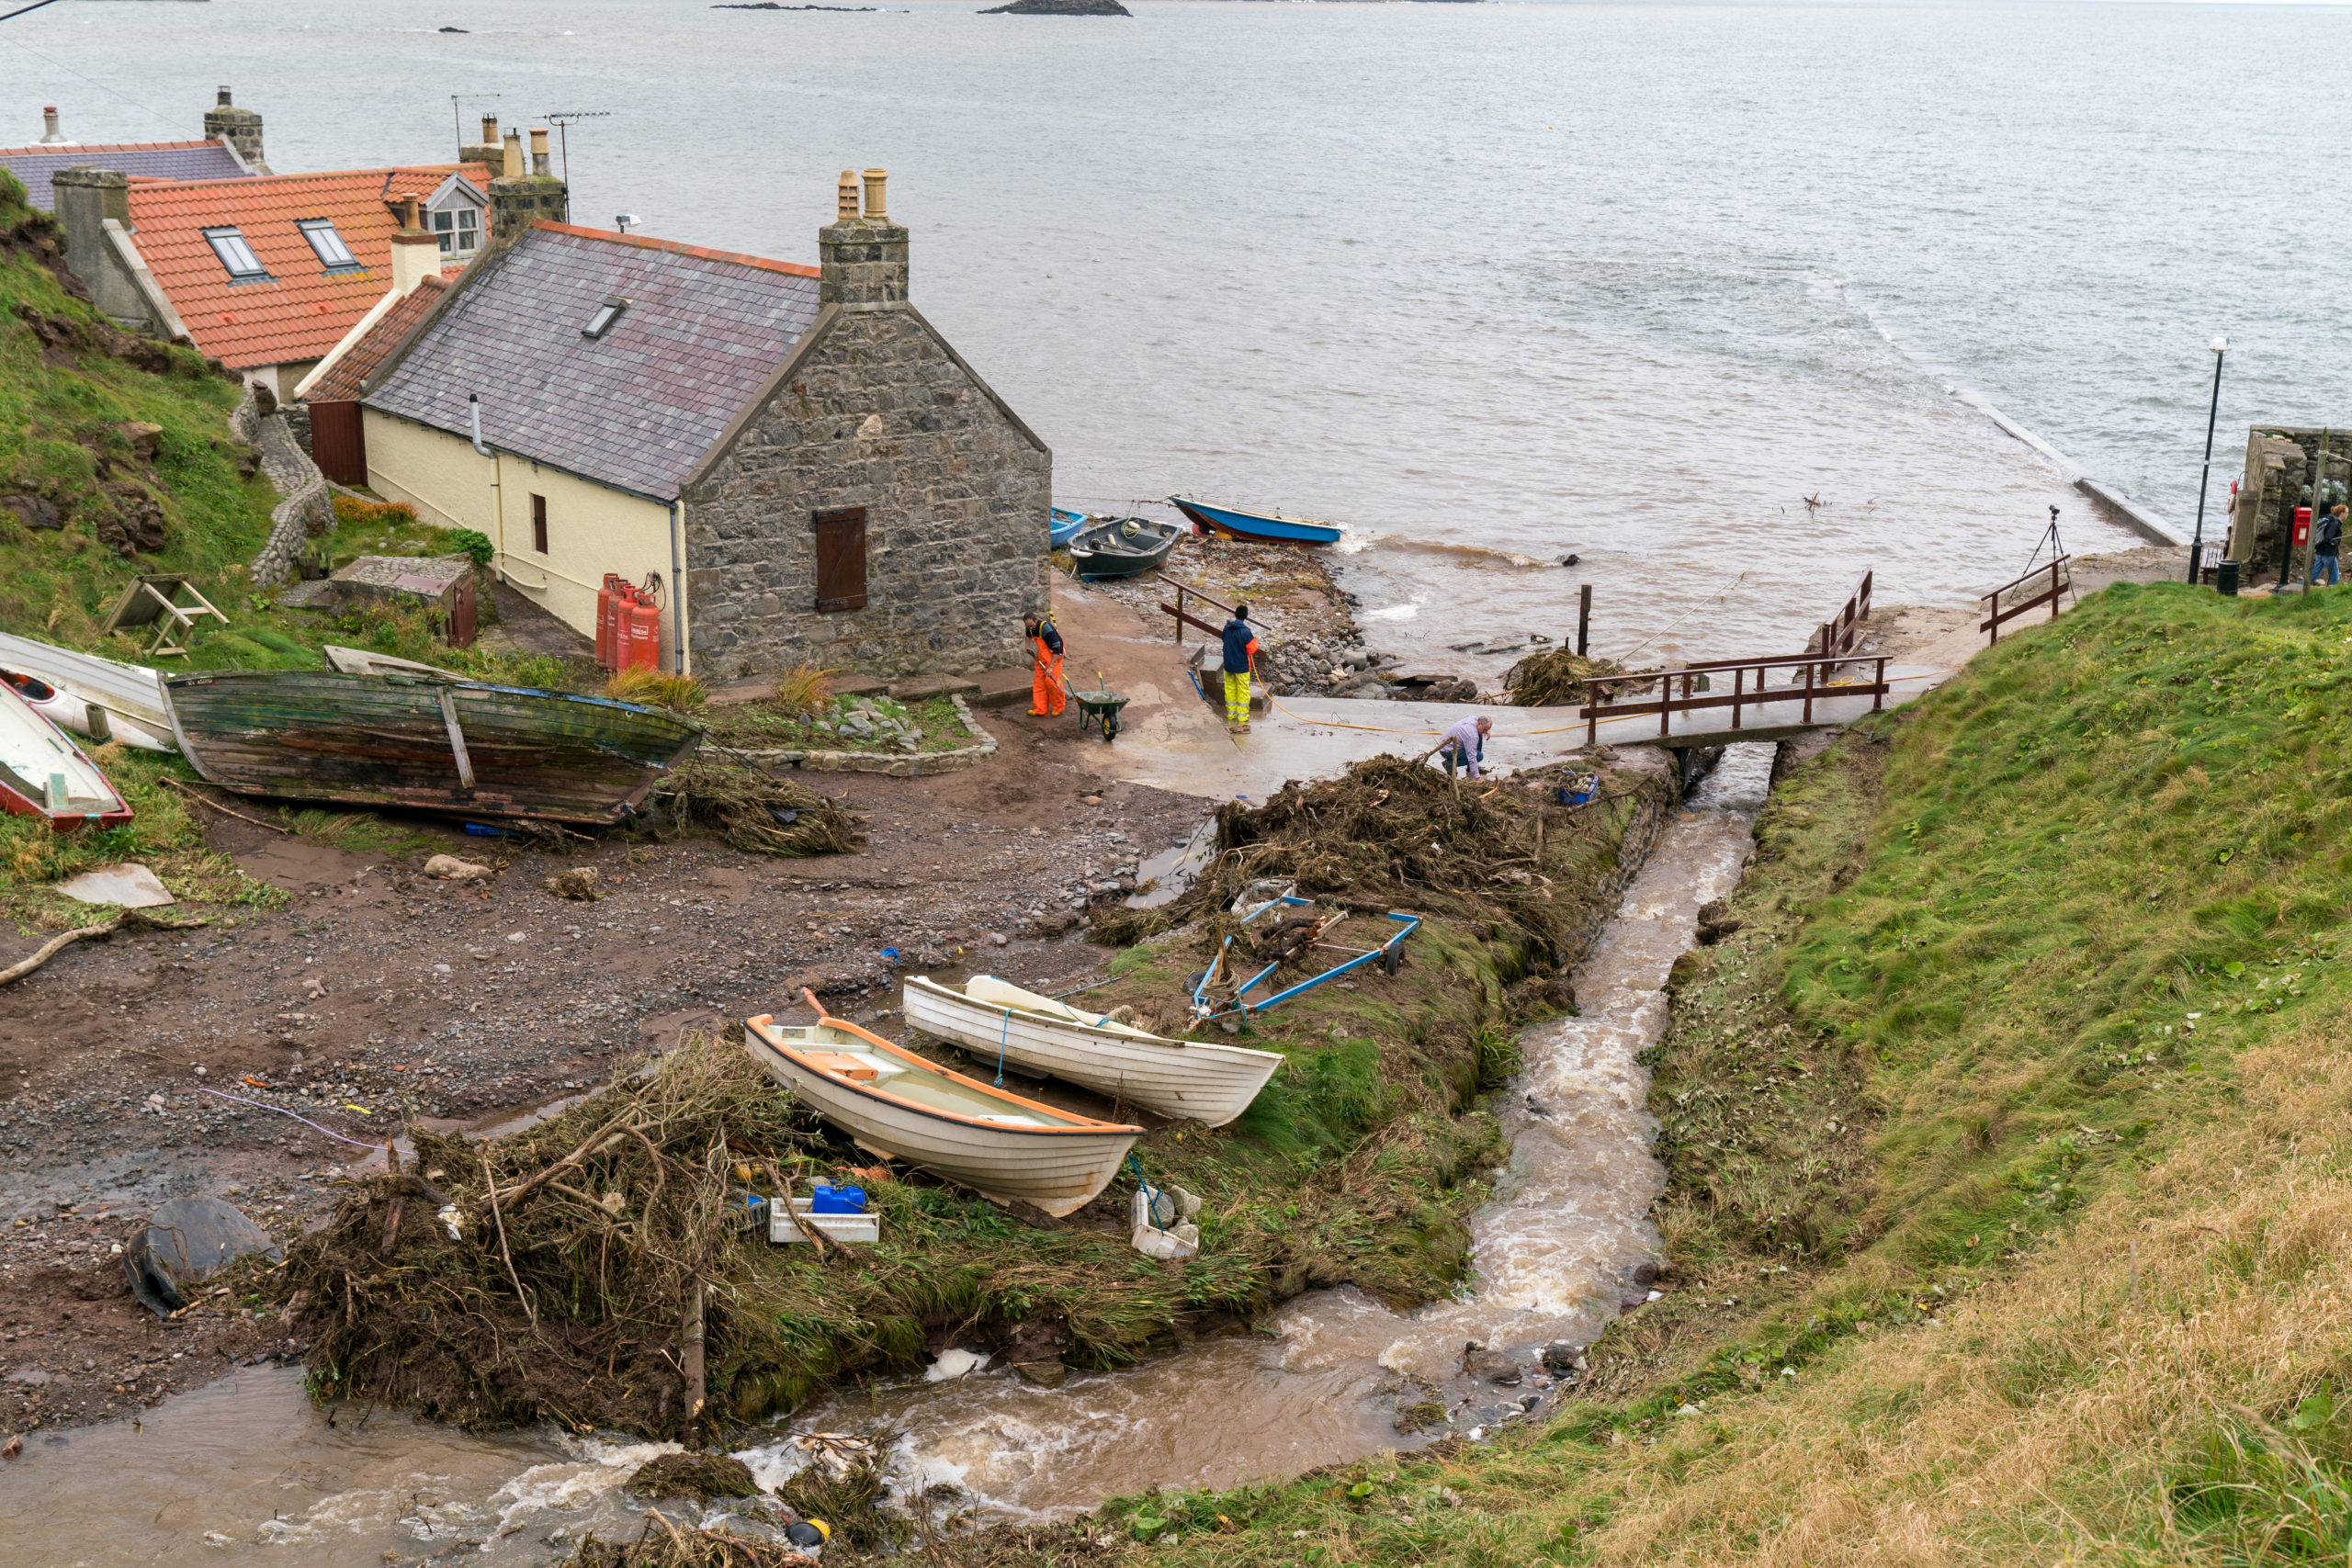 Aftermath of flash flooding in Crovie, Aberdeenshire.